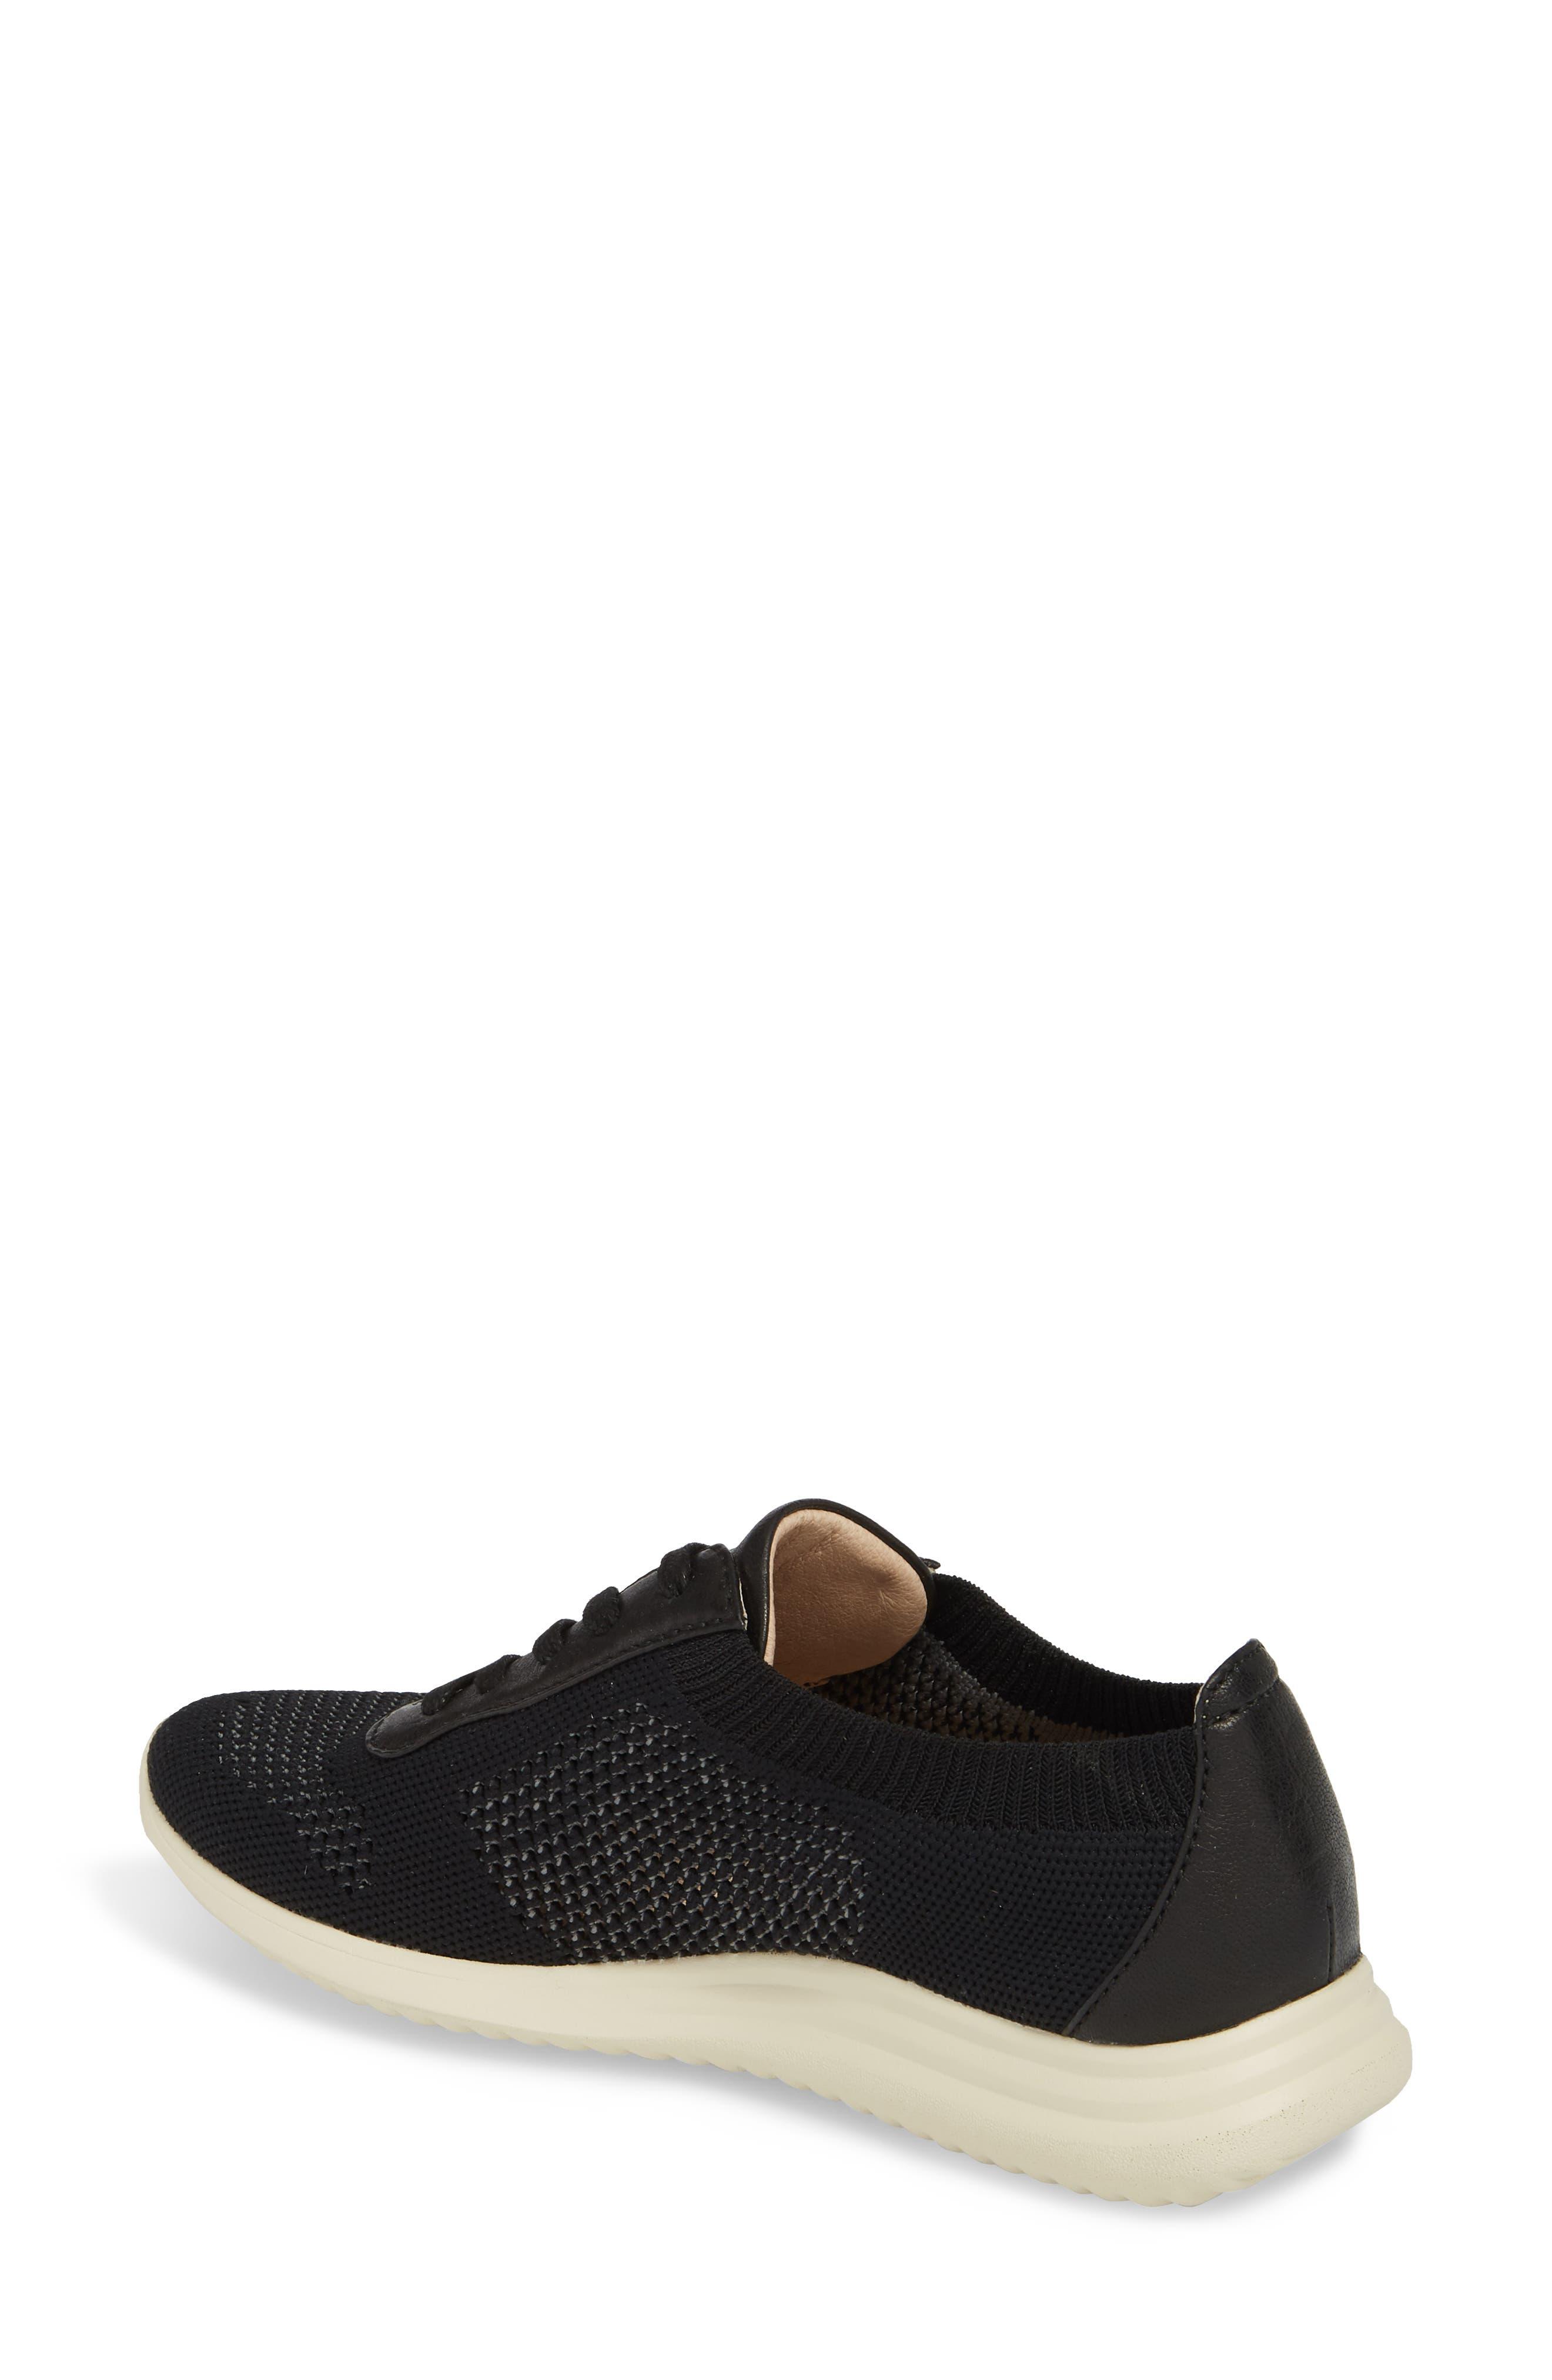 Novella Sneaker,                             Alternate thumbnail 2, color,                             Black Fabric